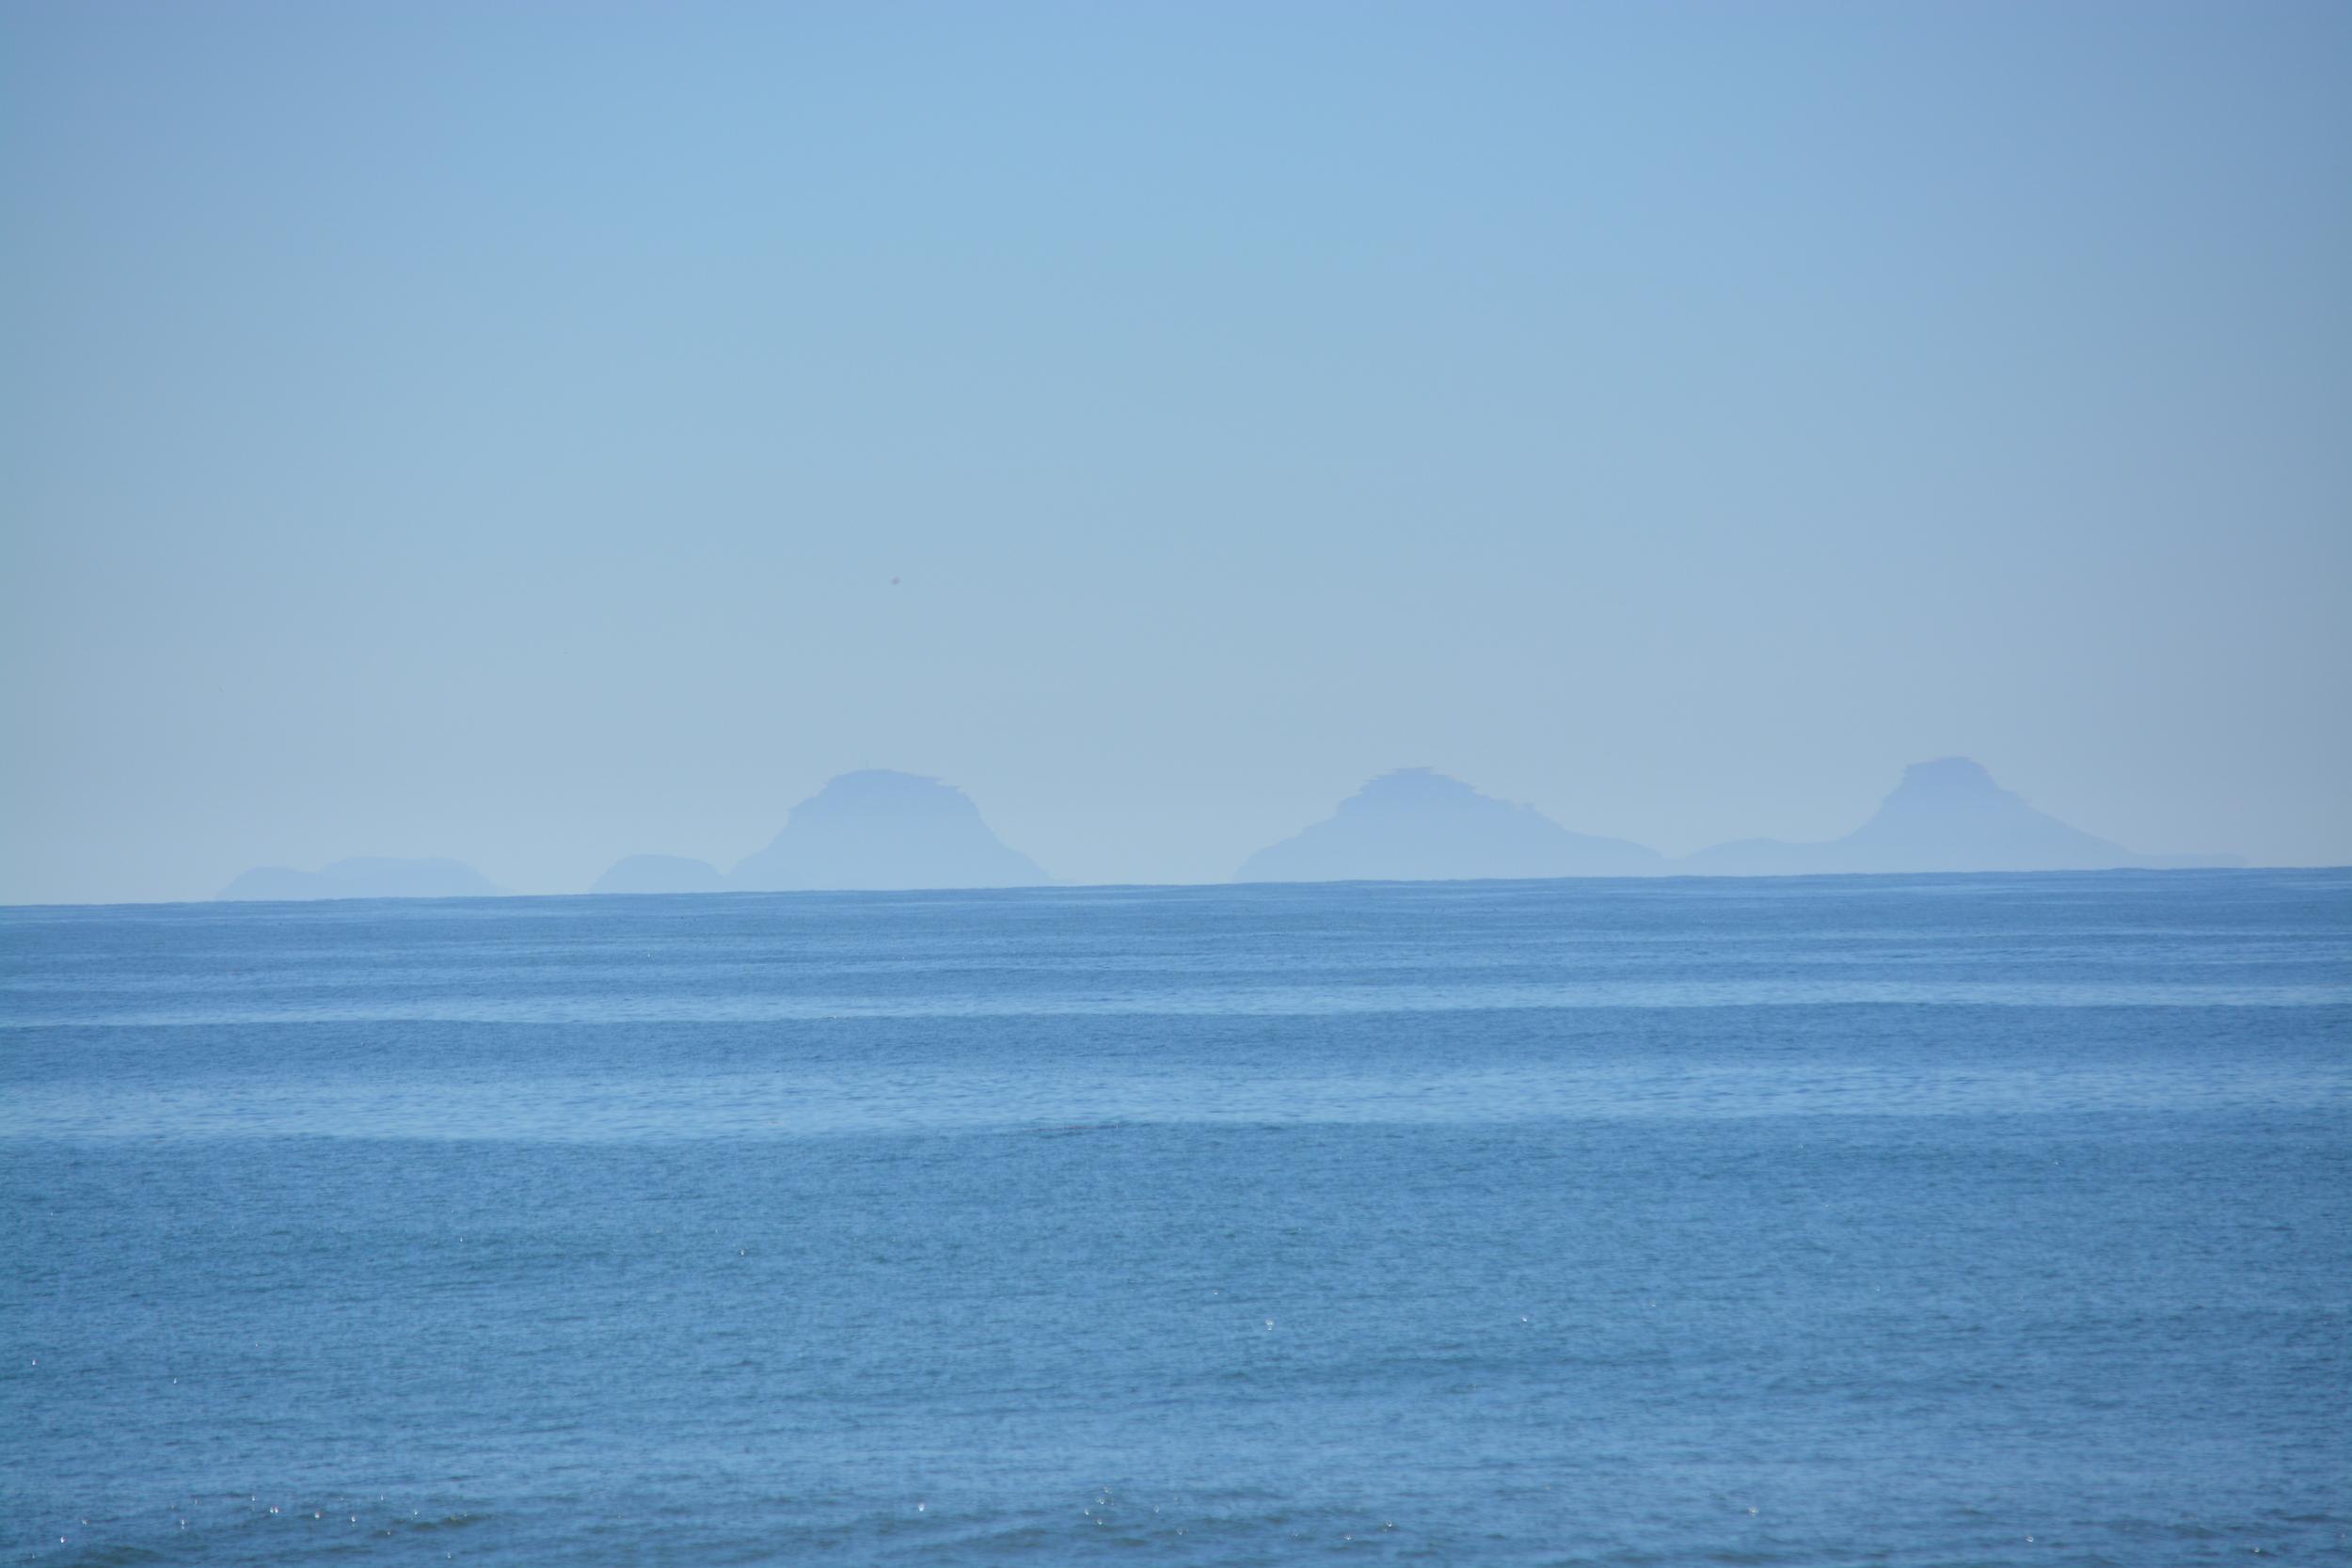 Baja California 10-5-13 Shipwrecks Surfing Adventure Ocean Experience Surf School San Diego (55).JPG